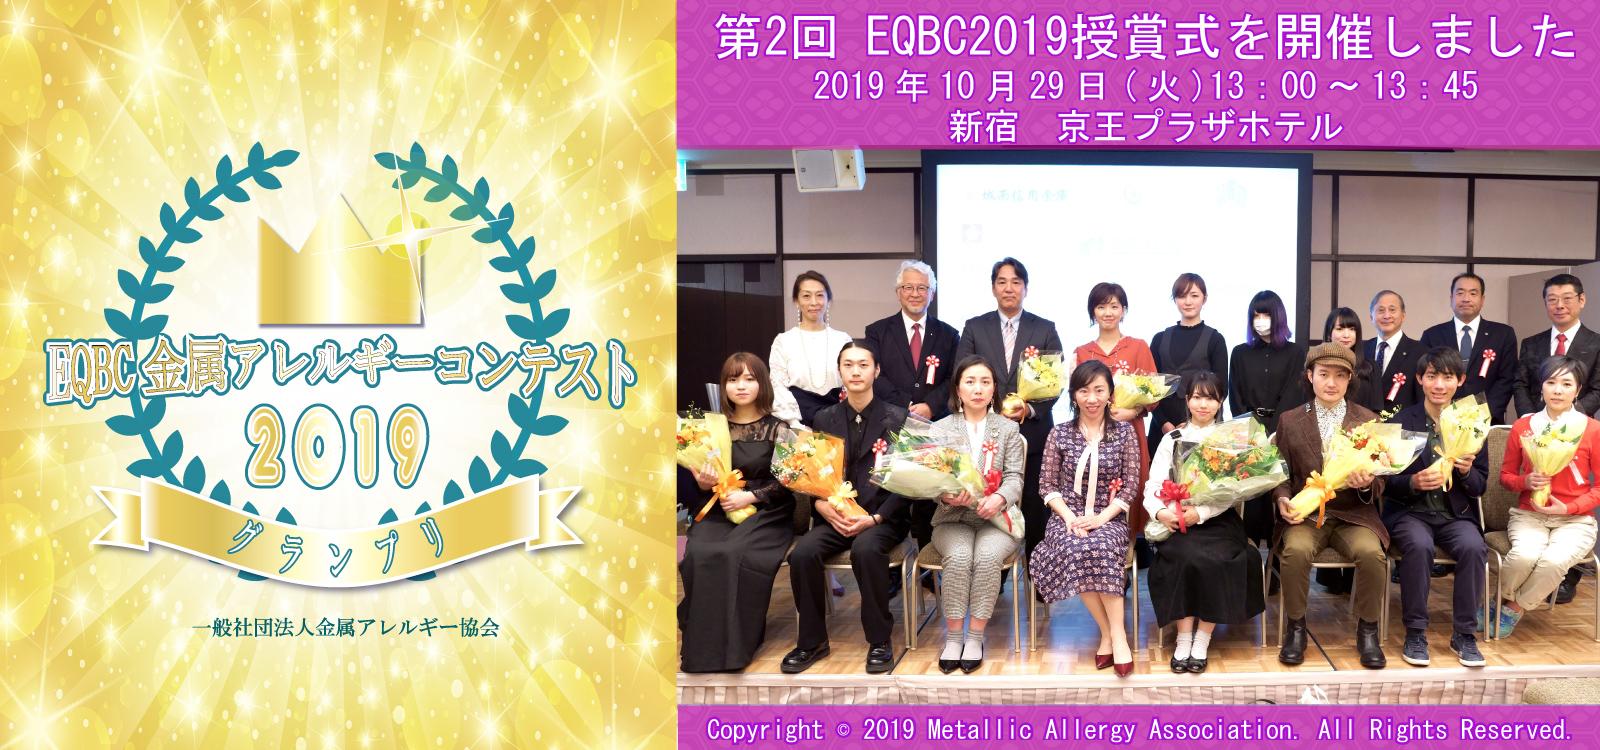 eqbc2019授賞式